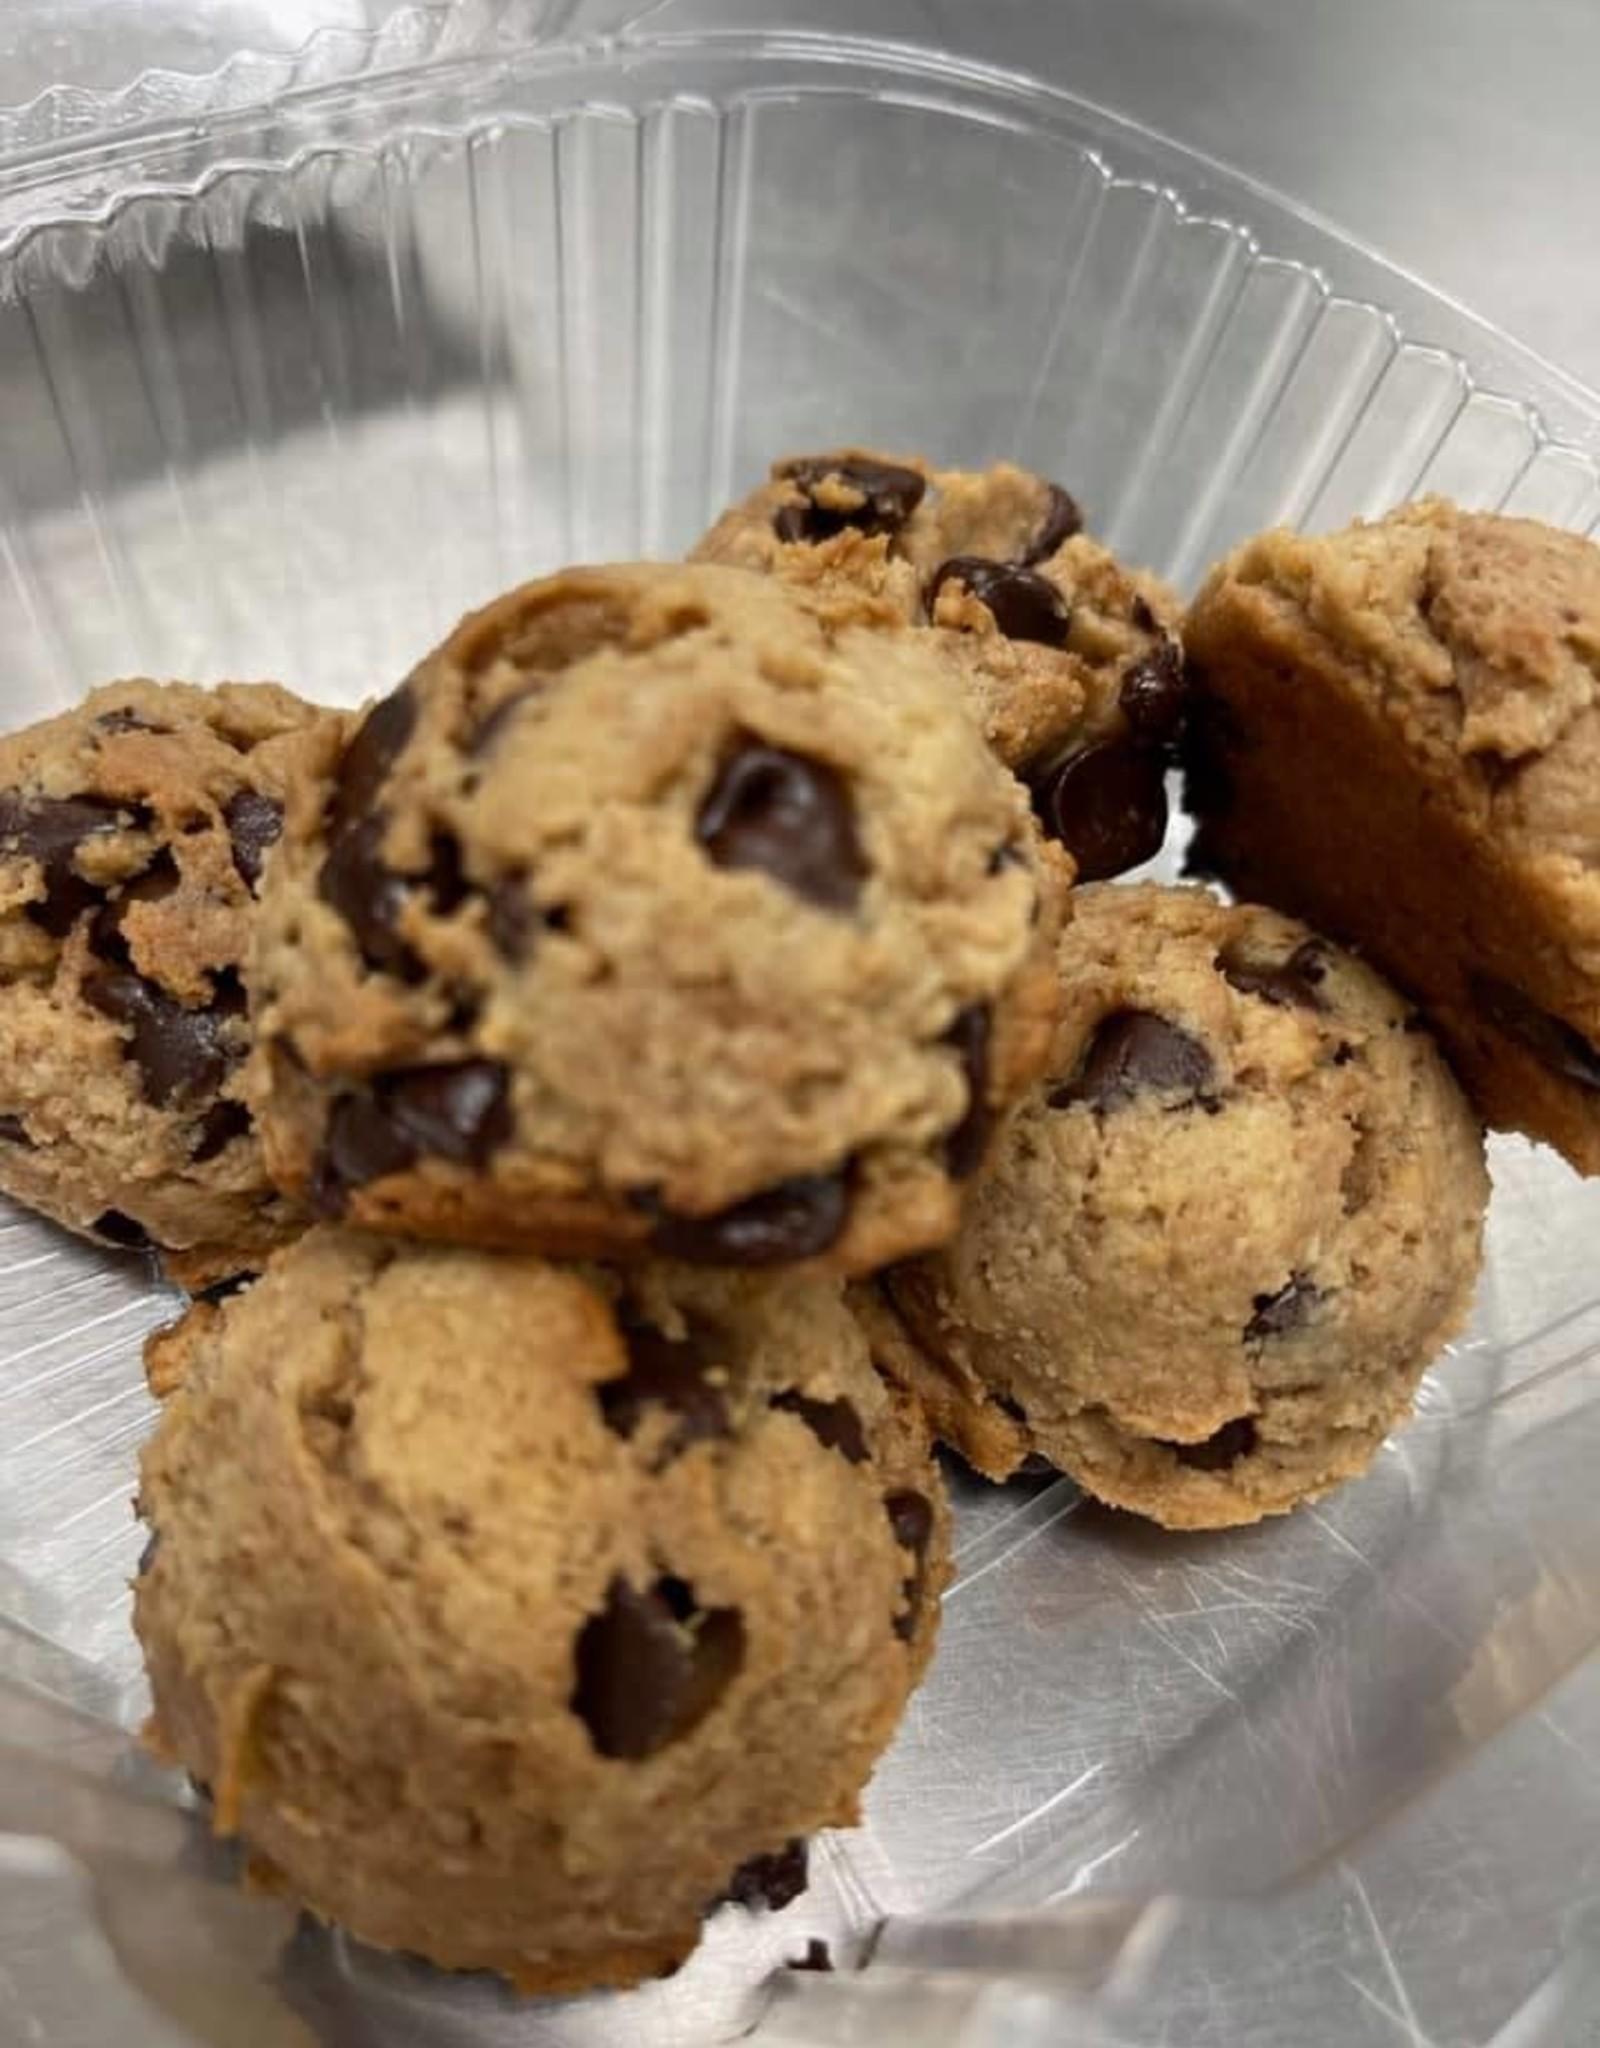 Locally Baked Outlet Locally Baked Outlet - Chocolate Chip Cookies